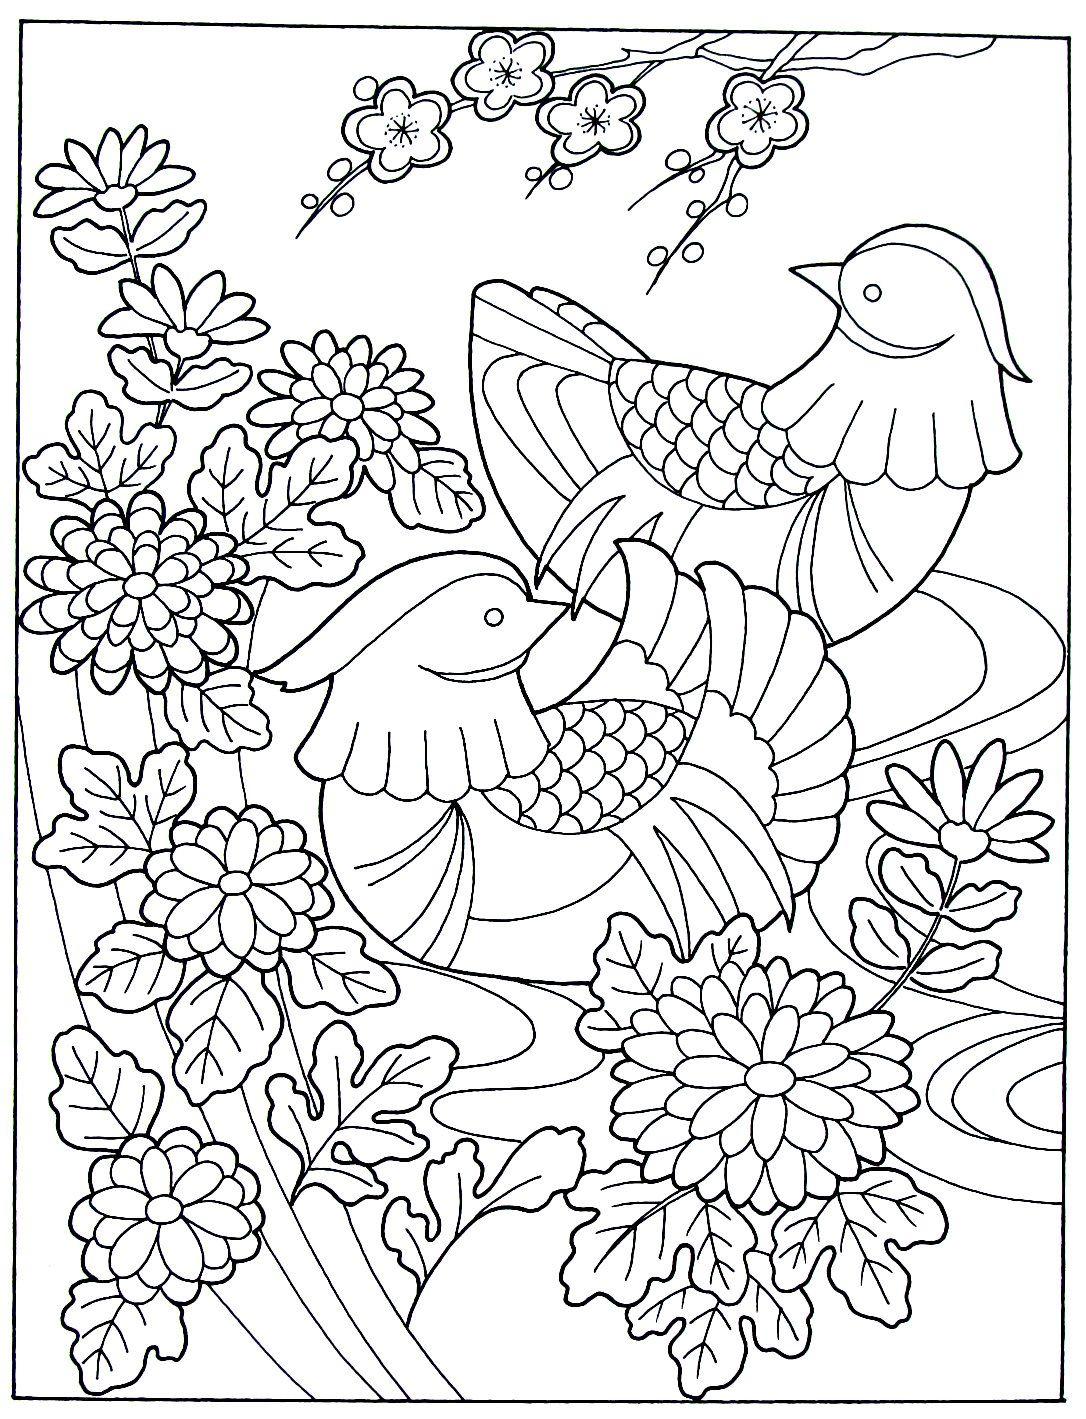 Wild ducks, chrysanthemums, and cherry blossoms - Japanese design ...